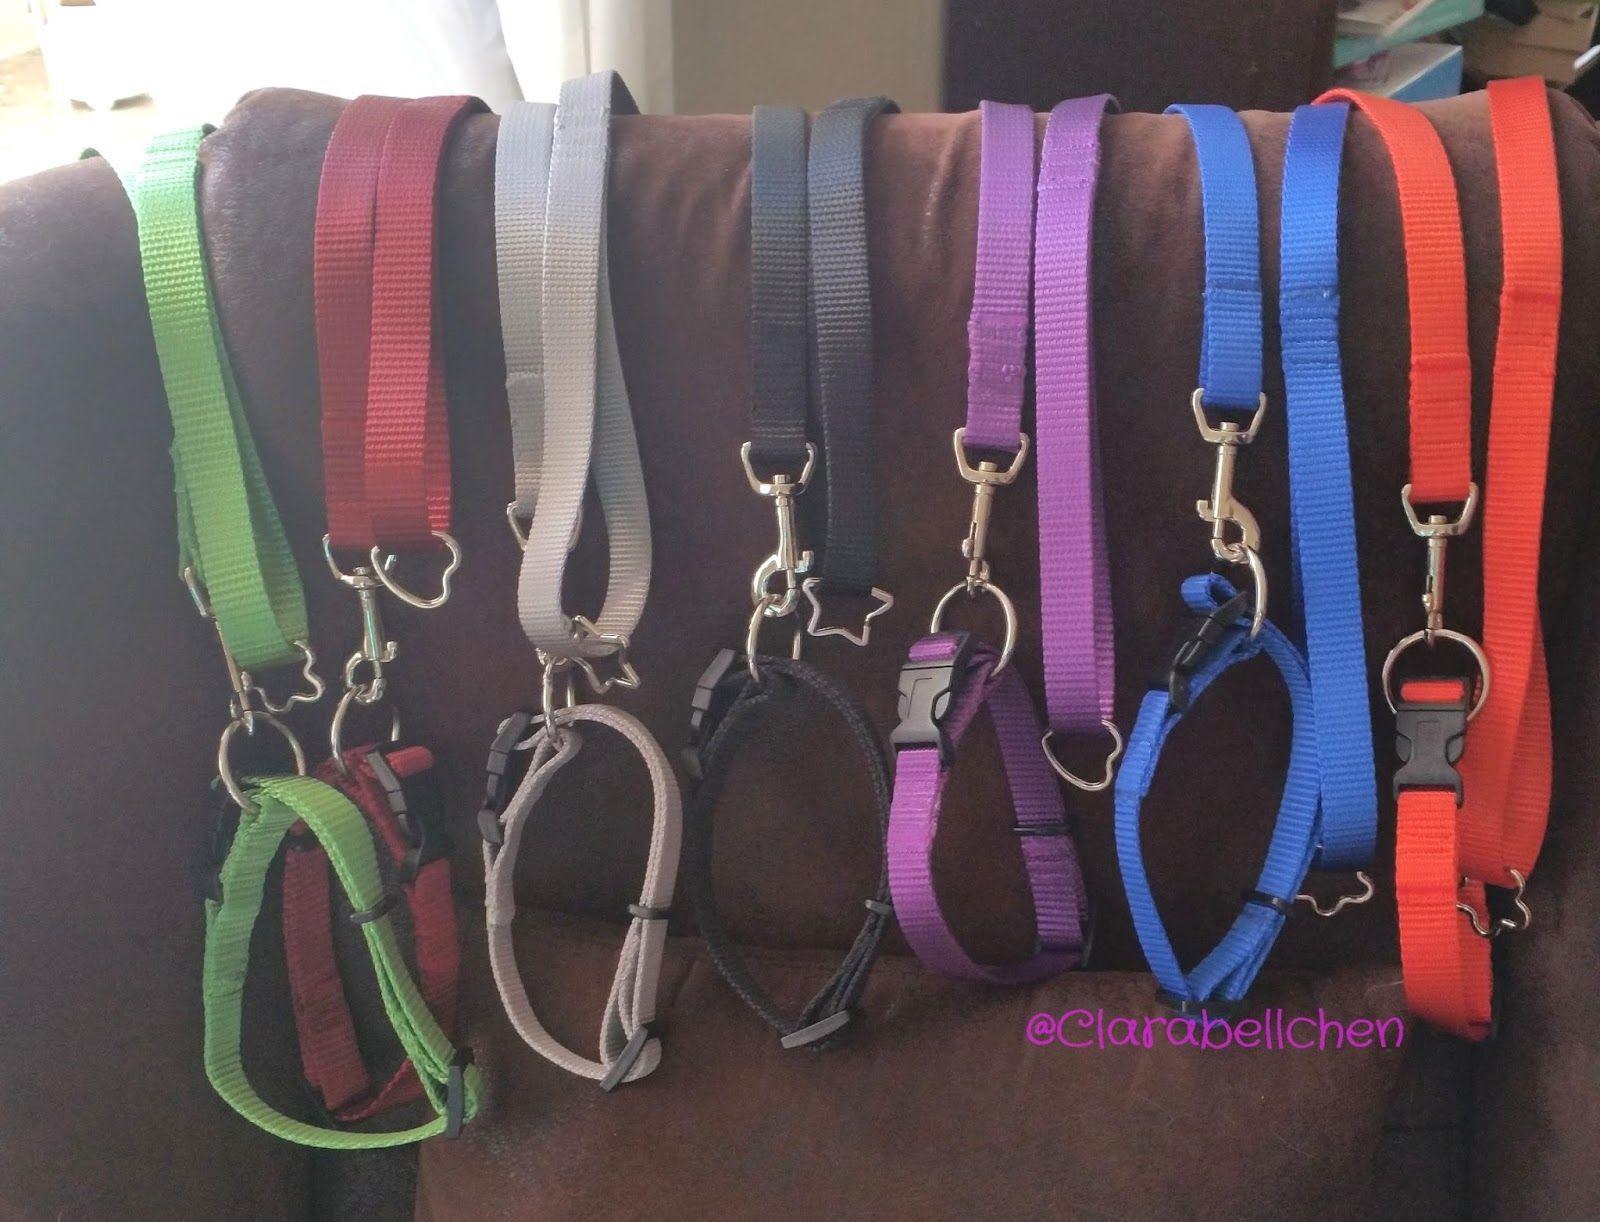 Hundehalsband mit Zugentlastung selber nähen | Jo | Pinterest ...